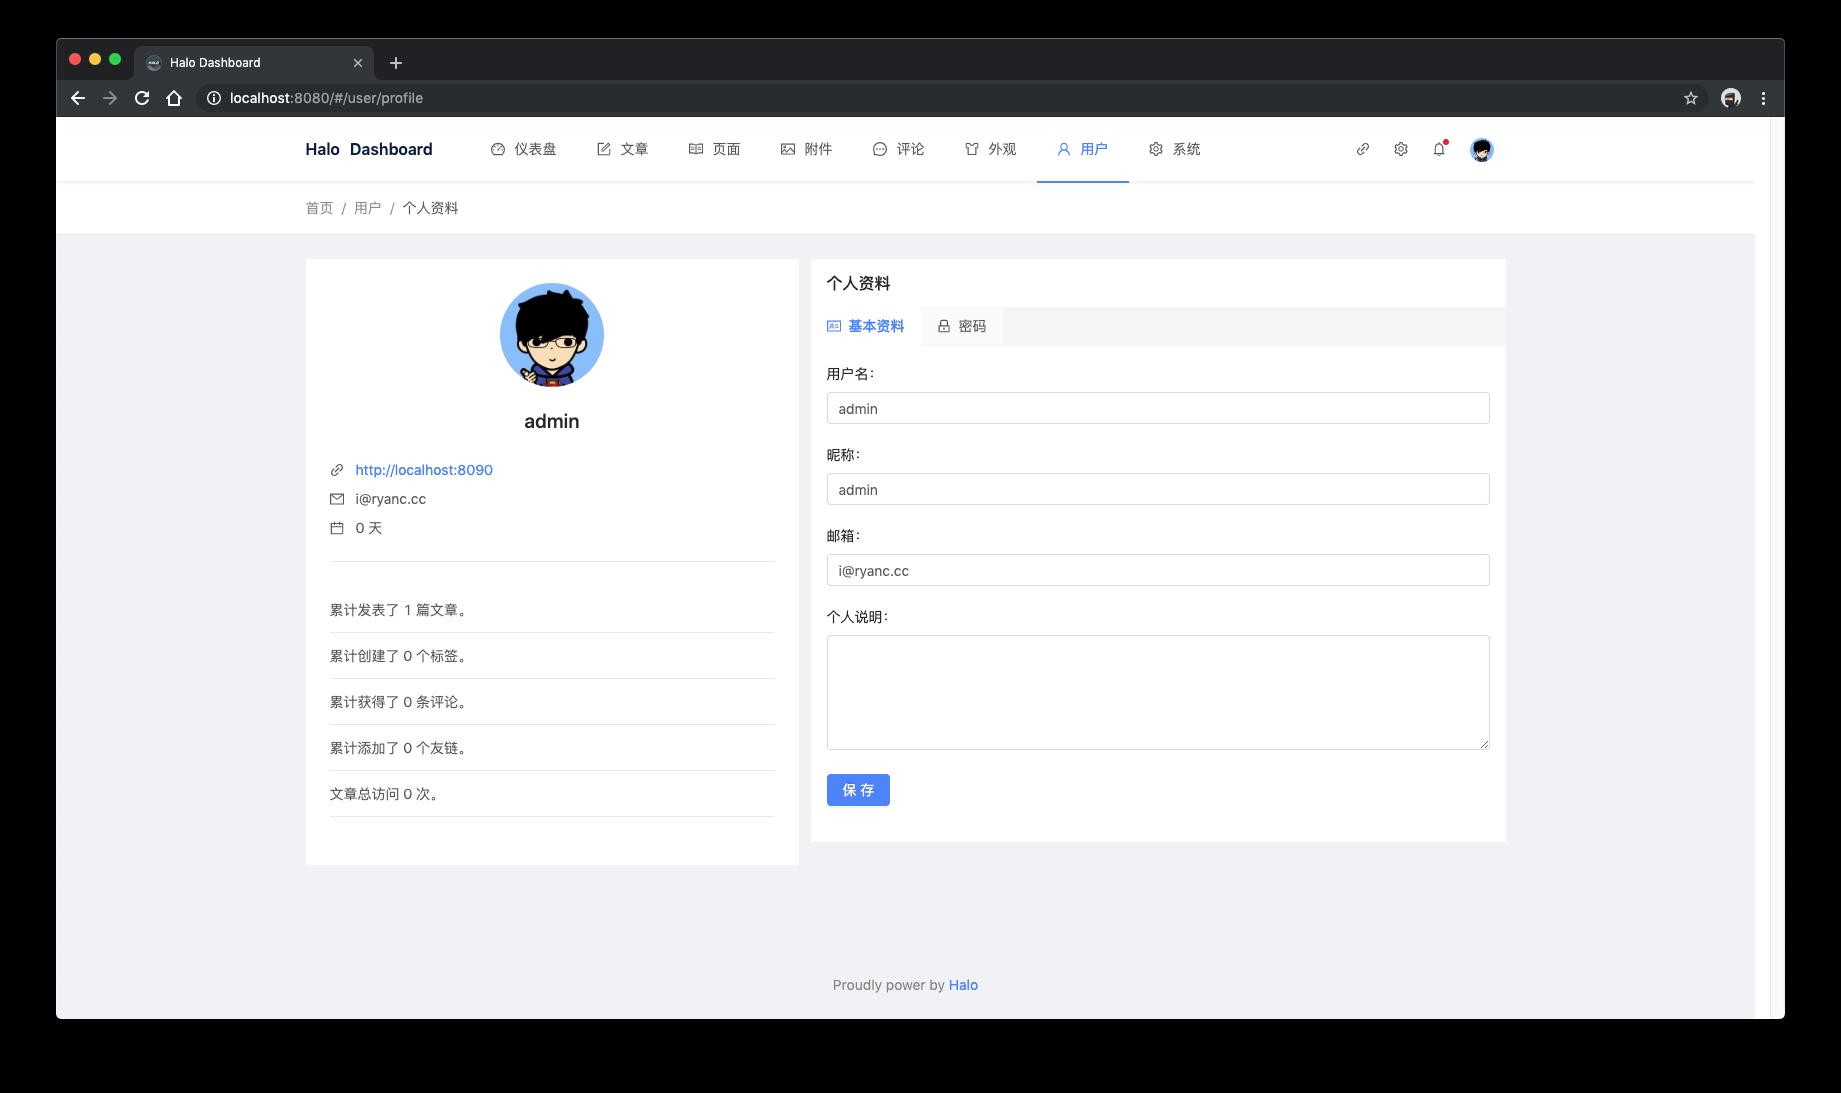 admin-profile.png